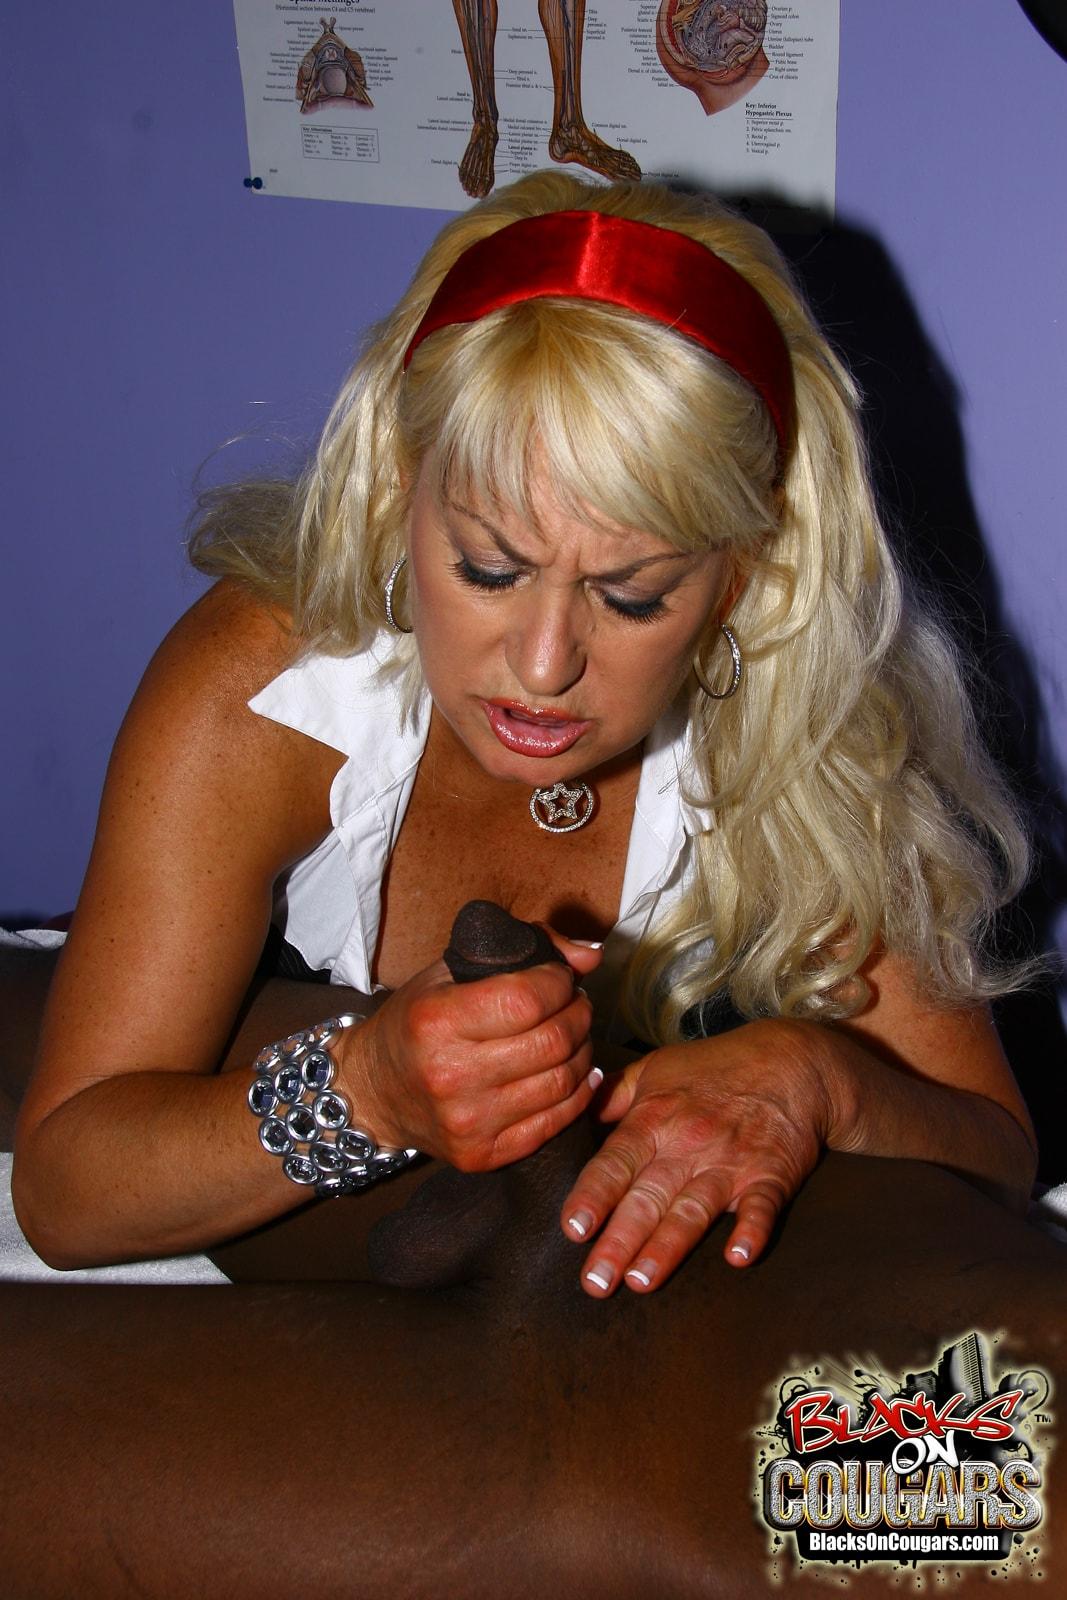 Dogfart '- Blacks On Cougars' starring Dana Hayes (Photo 11)